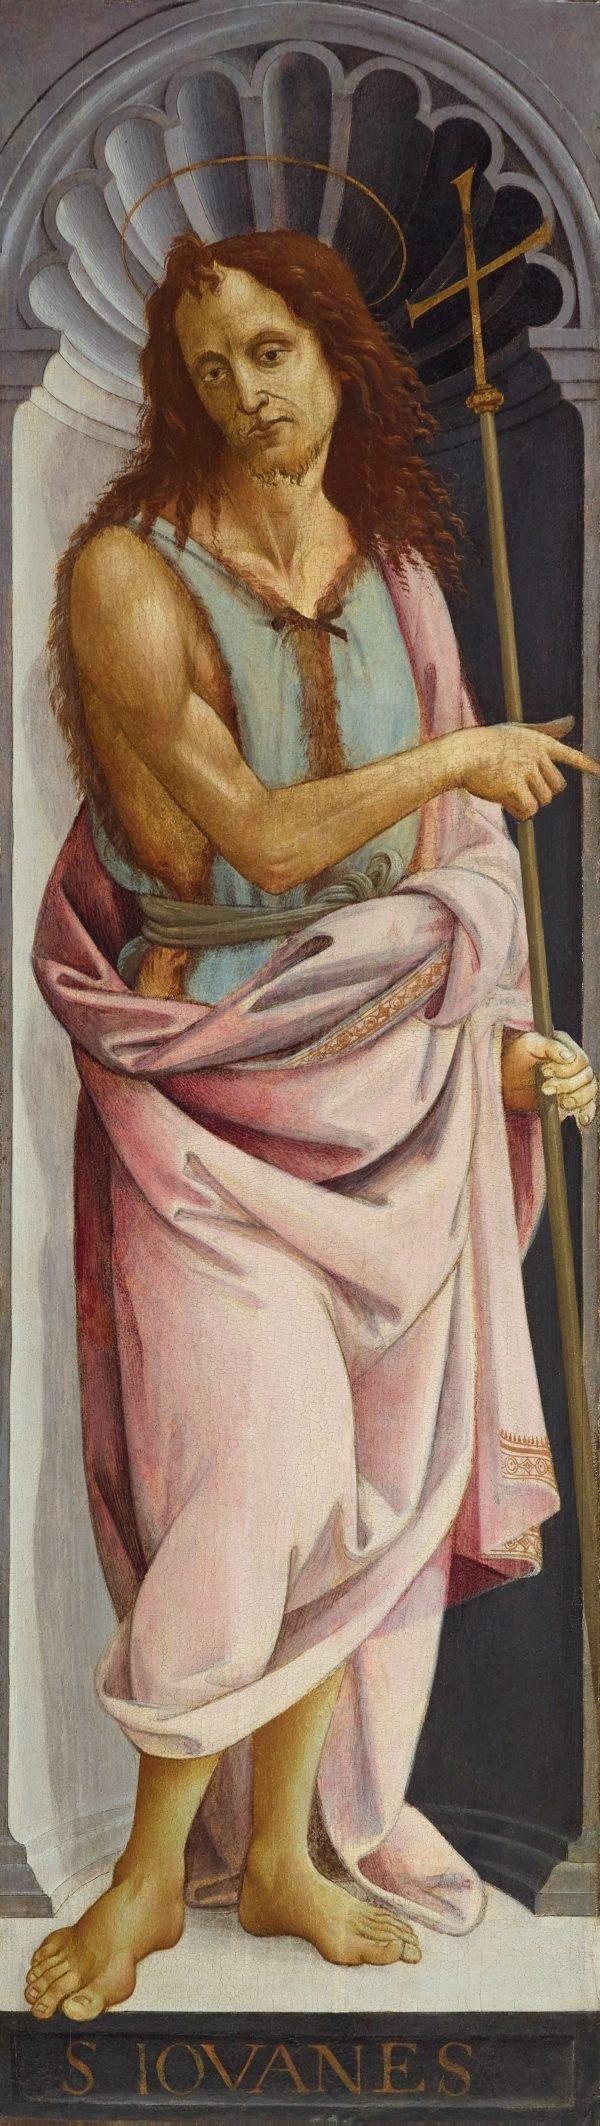 An image of Saint John the Baptist